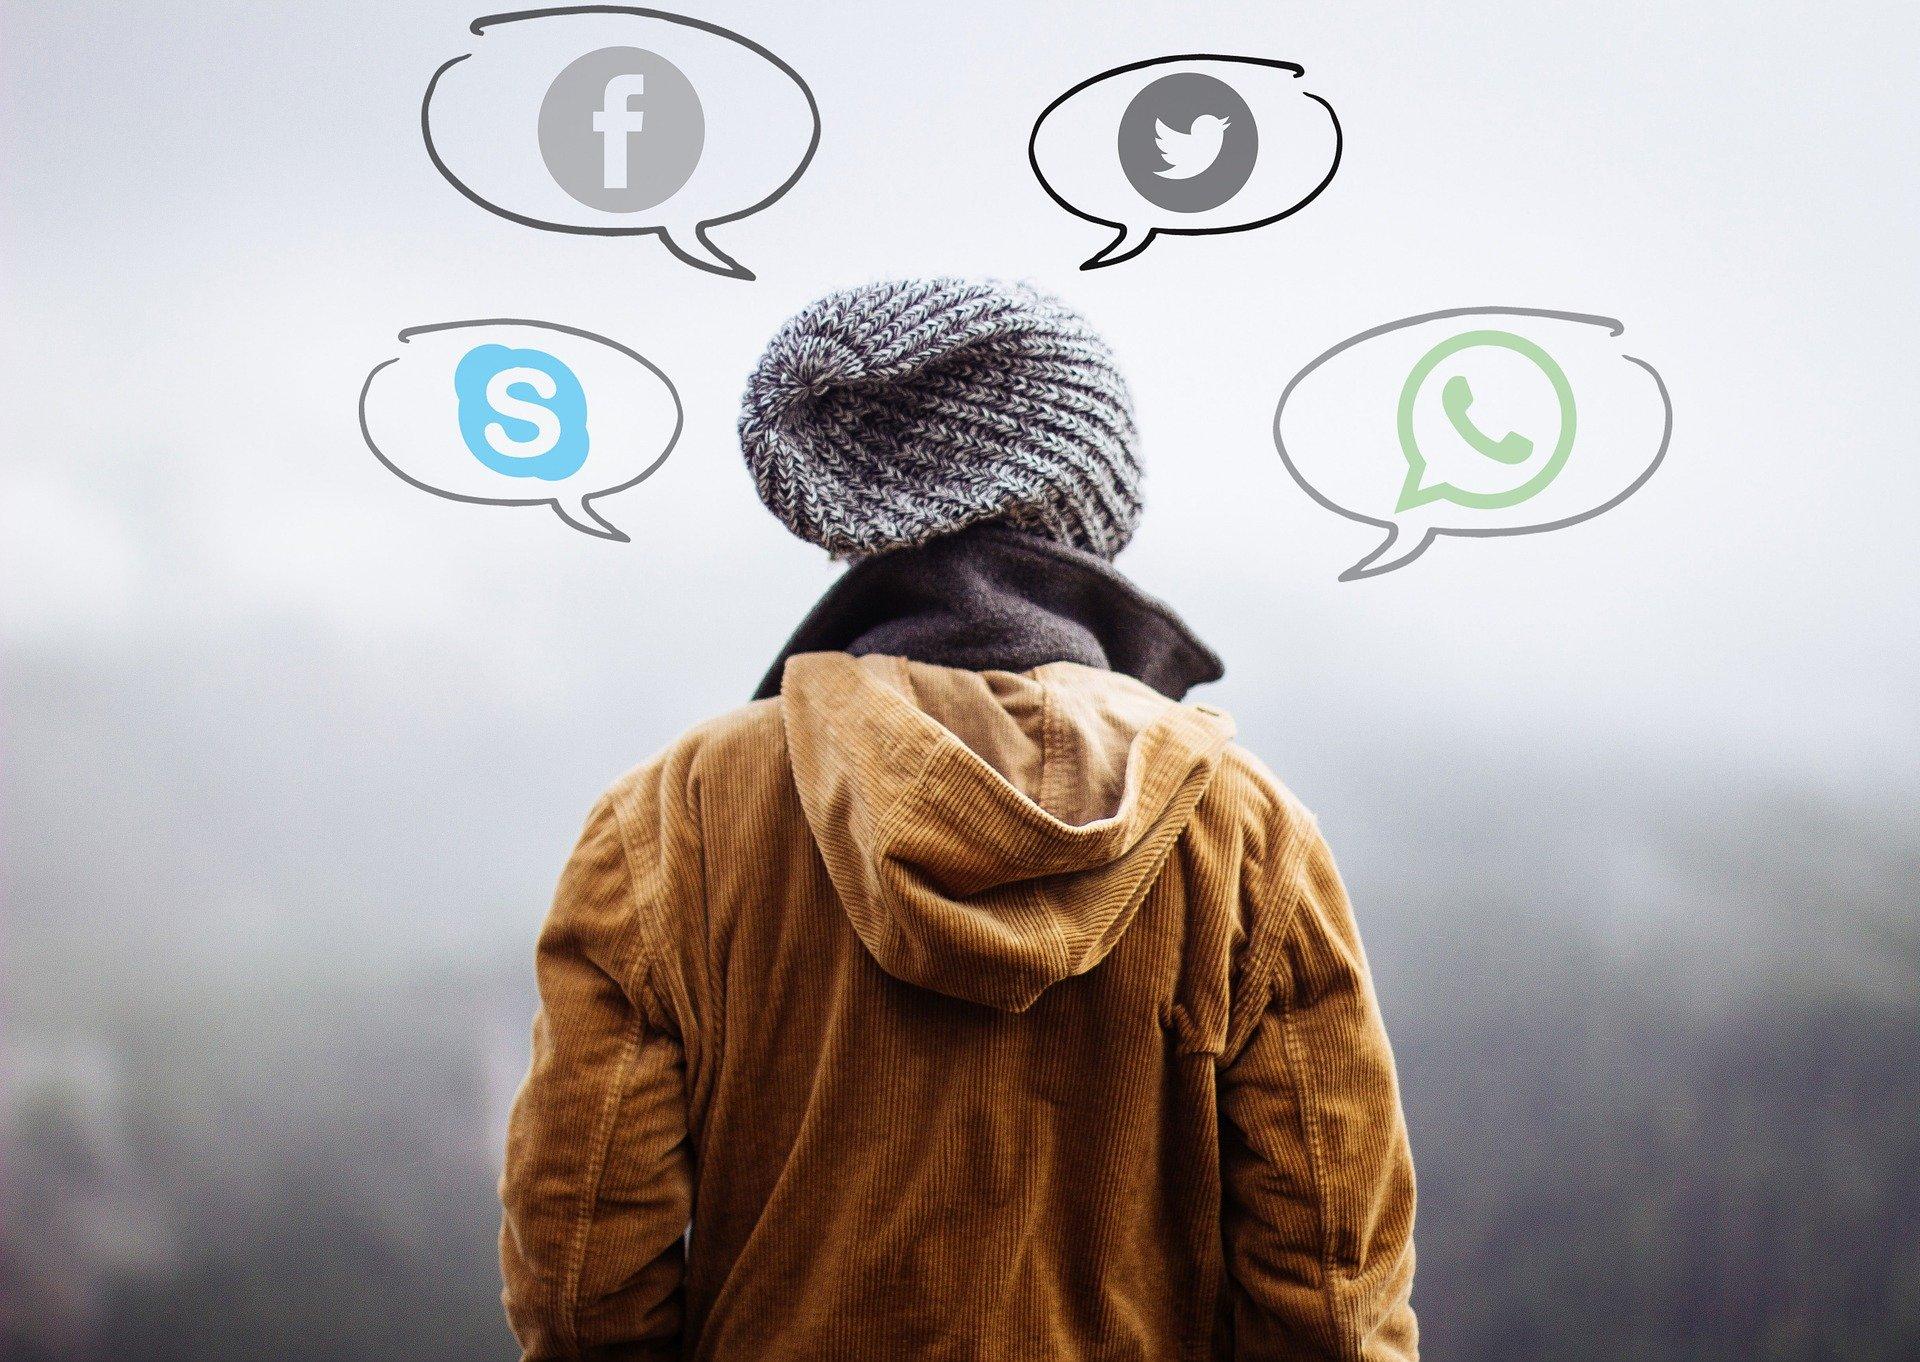 Uticaj društvenih mreža na razvoj dece